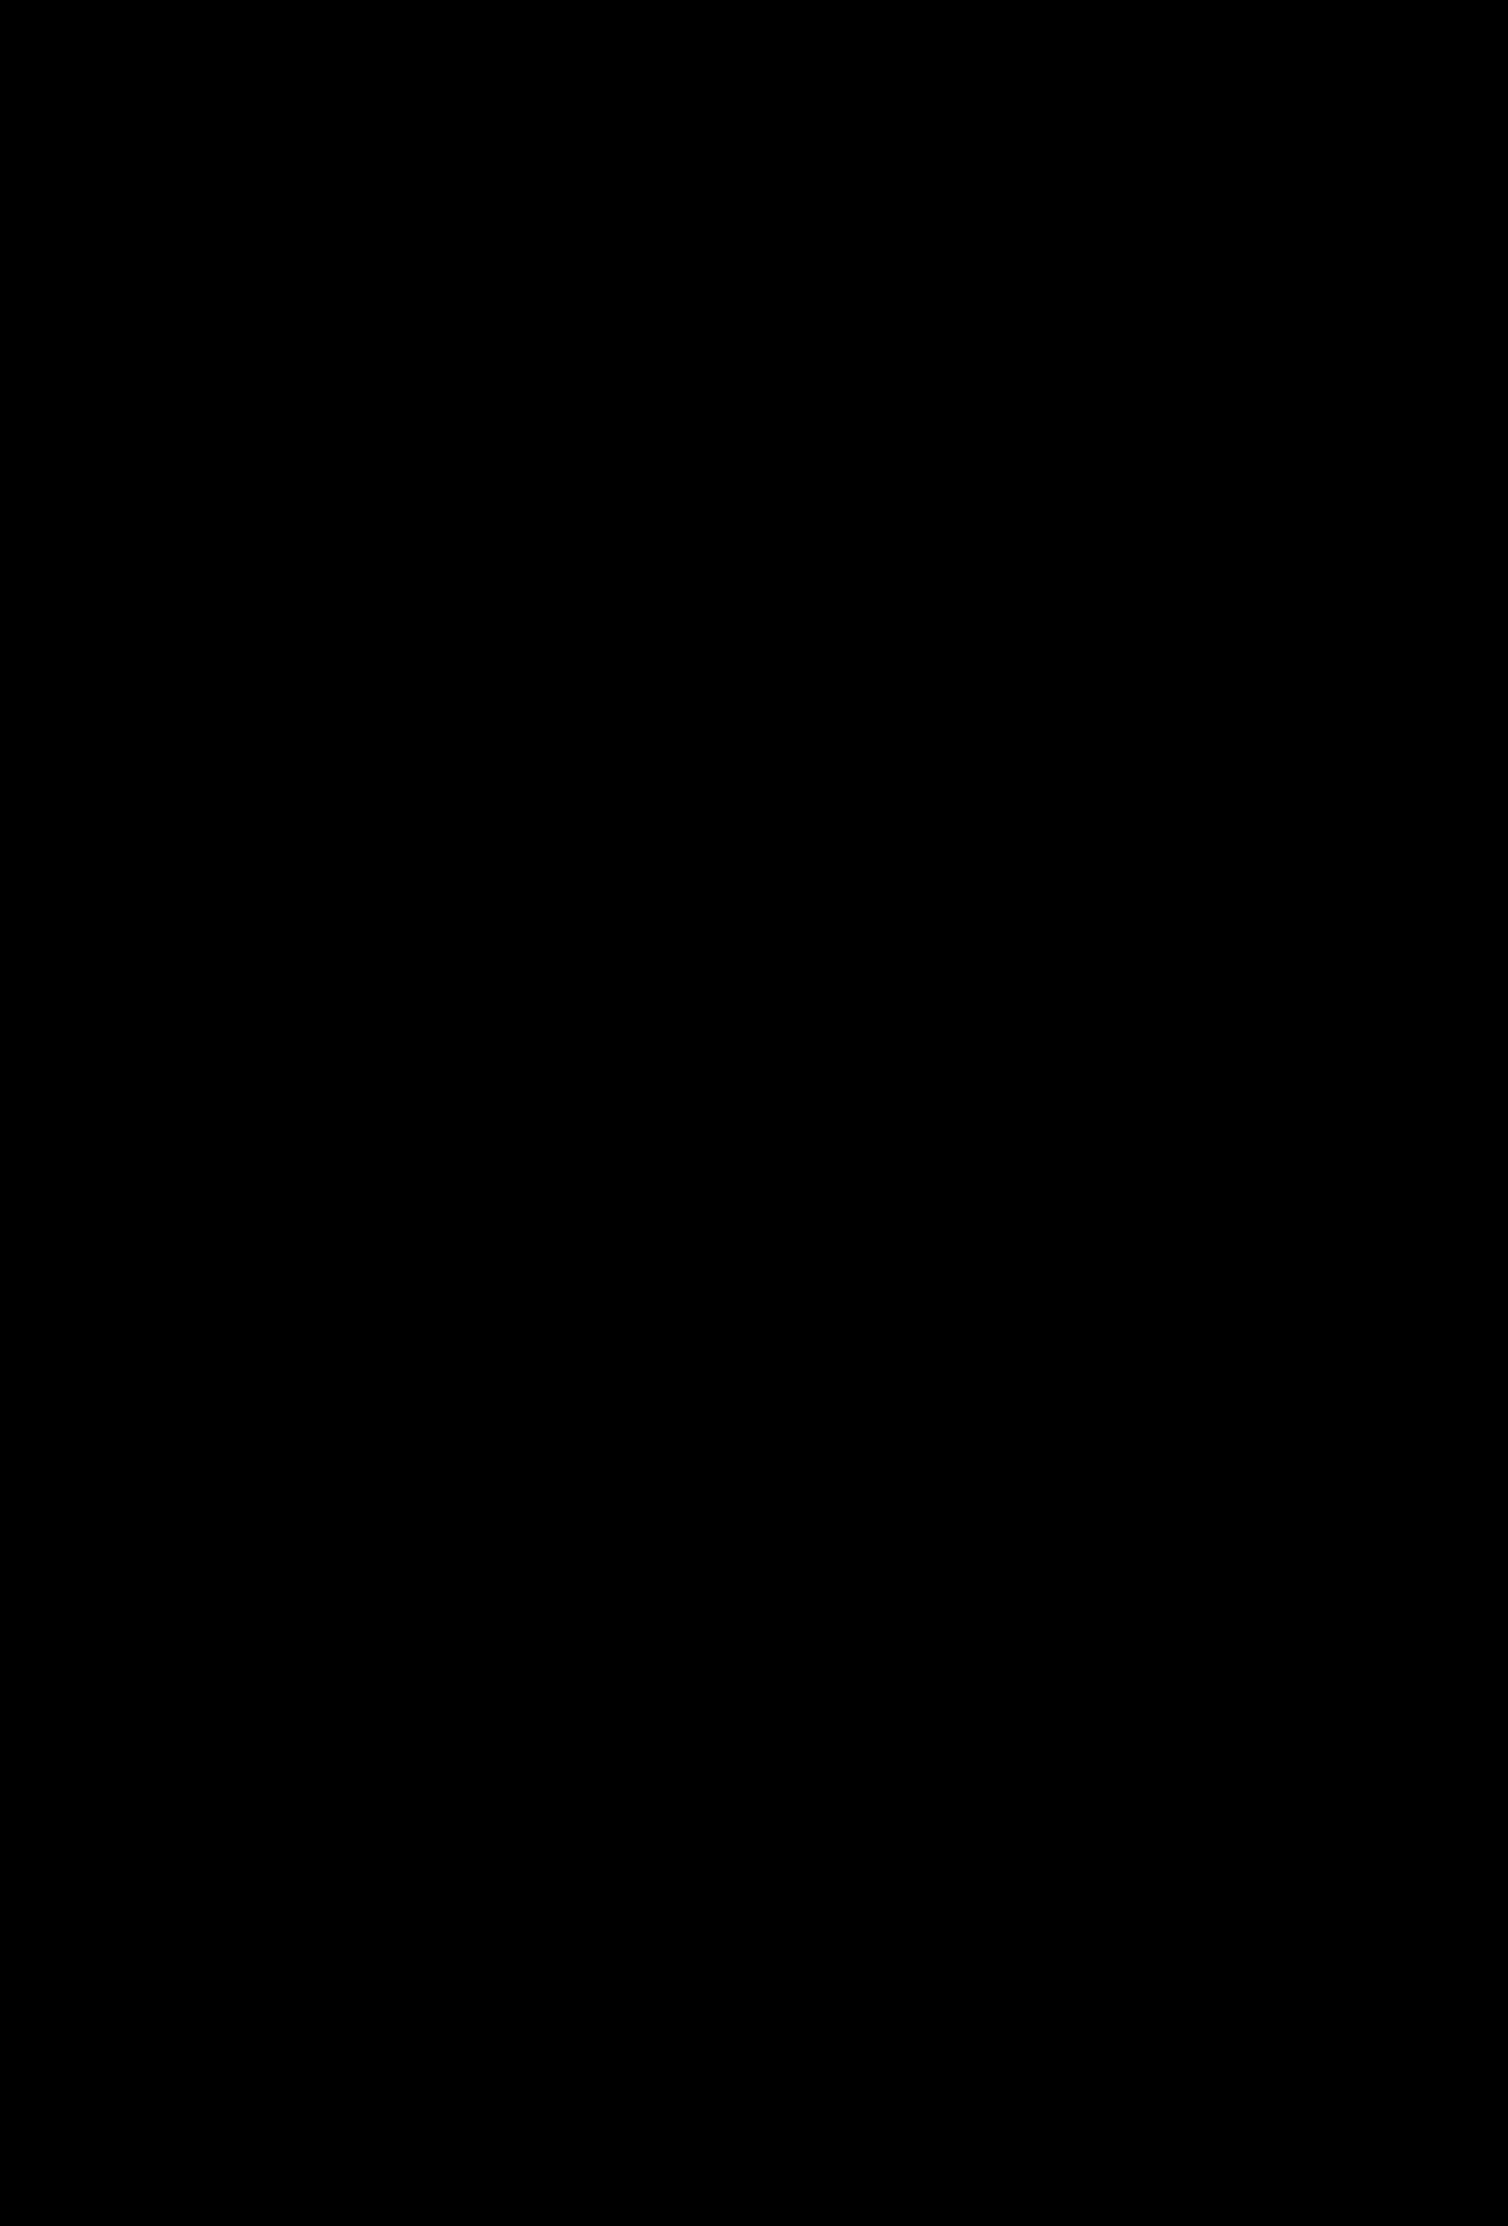 1508x2226 Clipart